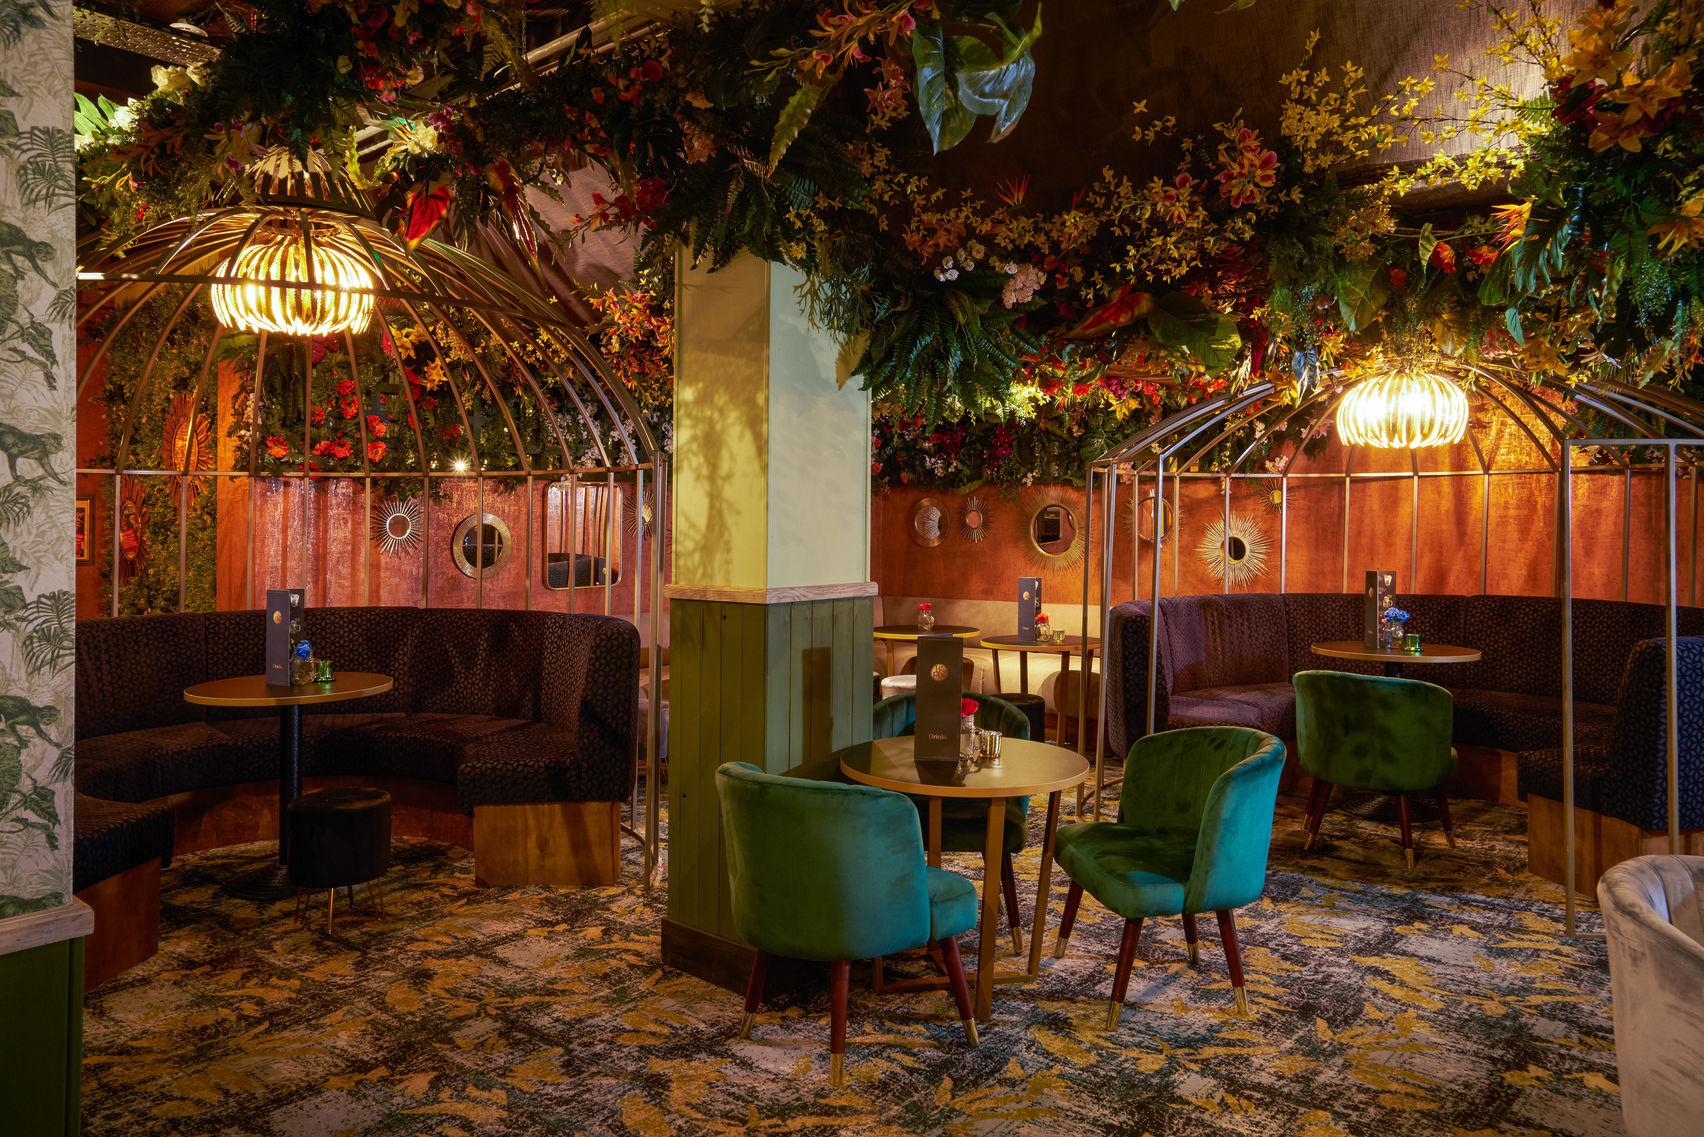 Le Fez East Putney | London Club Reviews | DesignMyNight